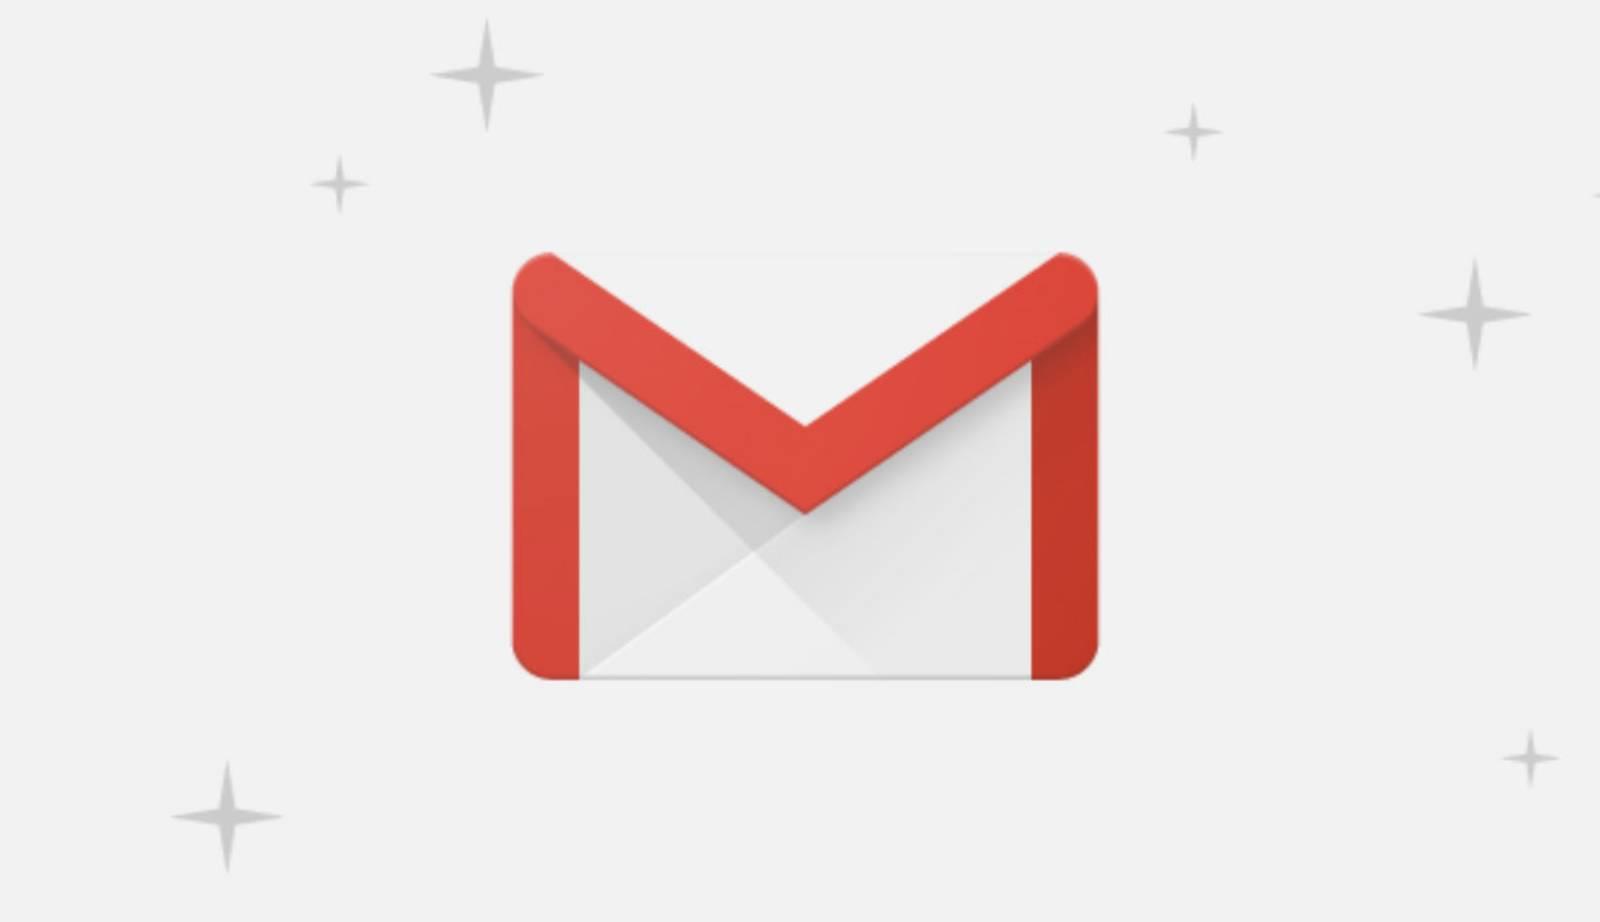 GMAIL. Noile Functii IMPORTANTE Lansate de catre Google